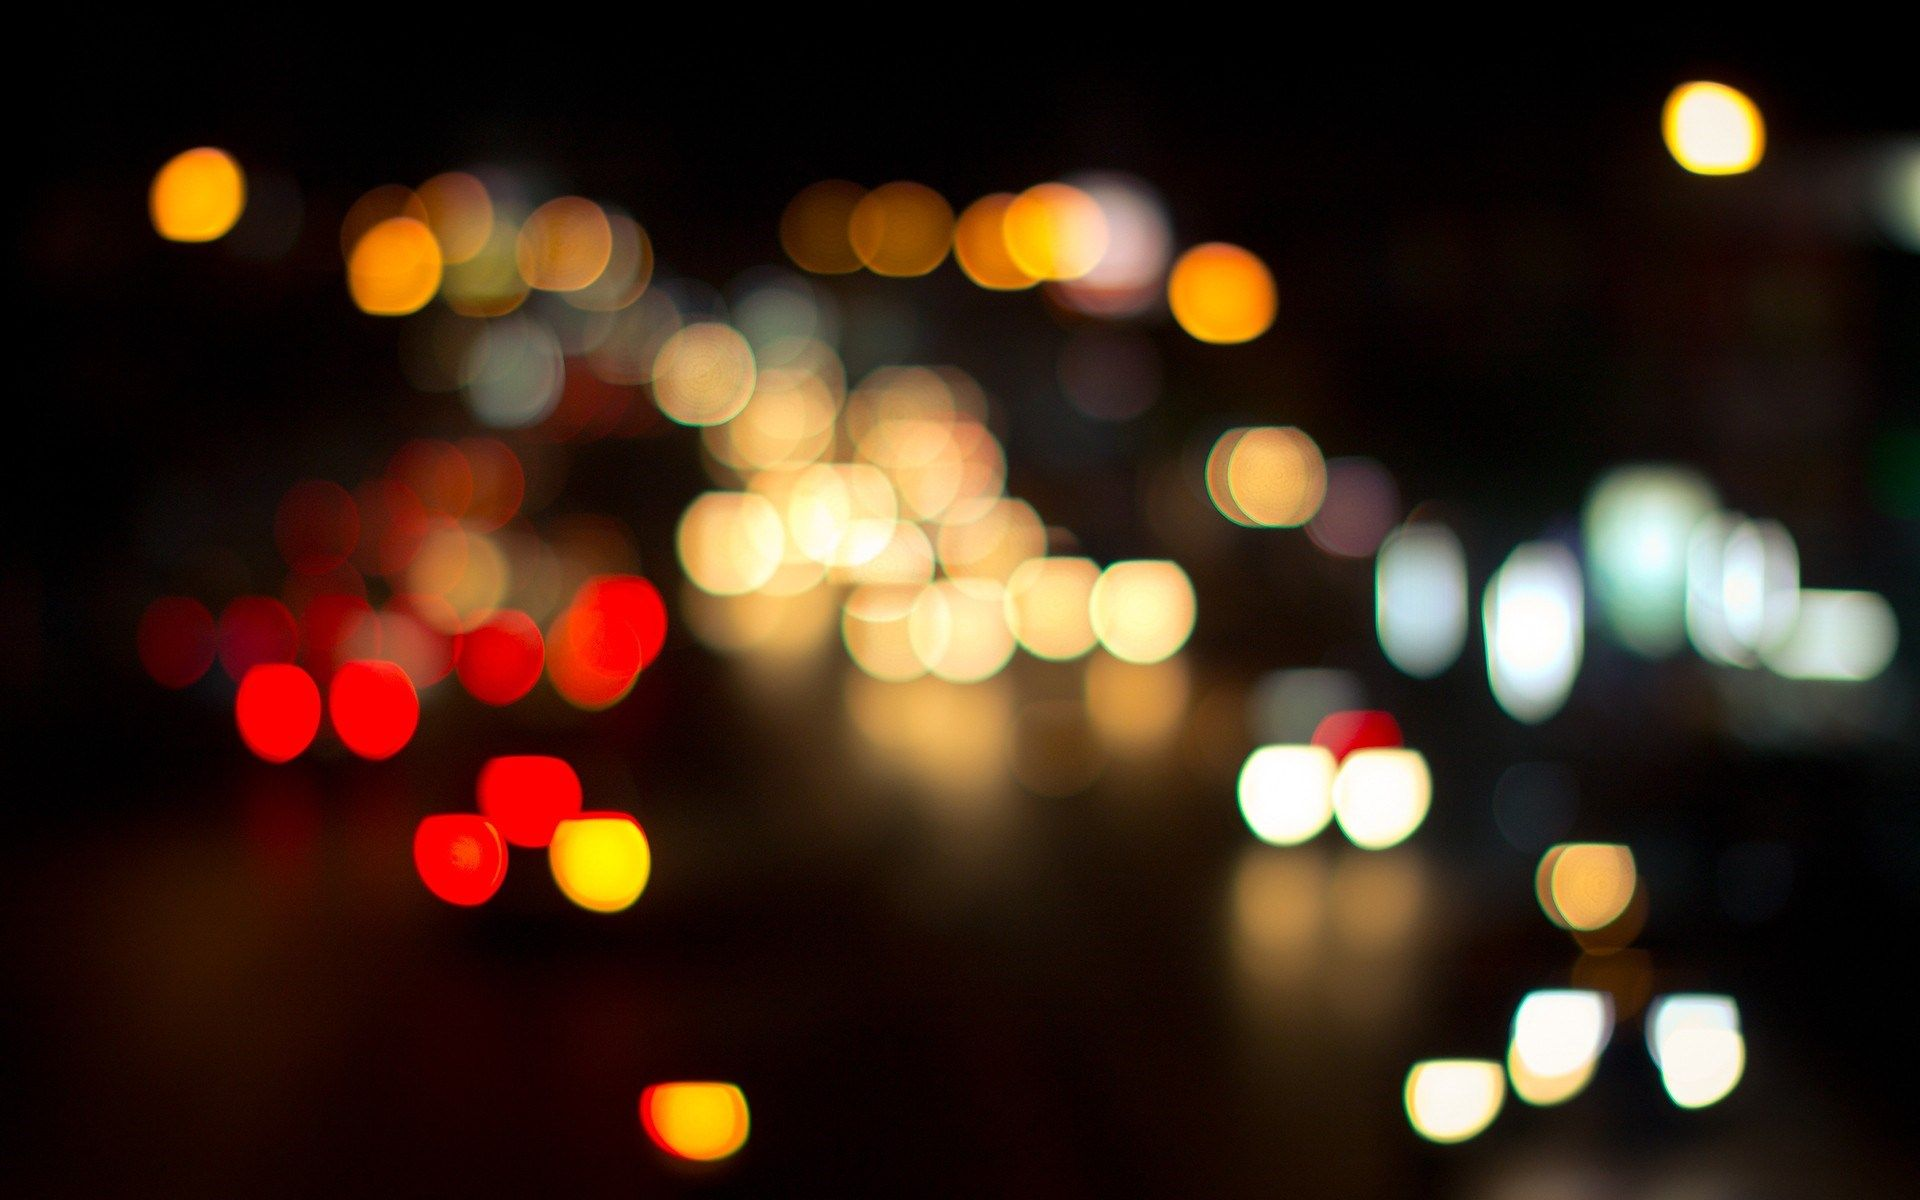 Bokeh Lights Night City Hd Wallpaper Desktop